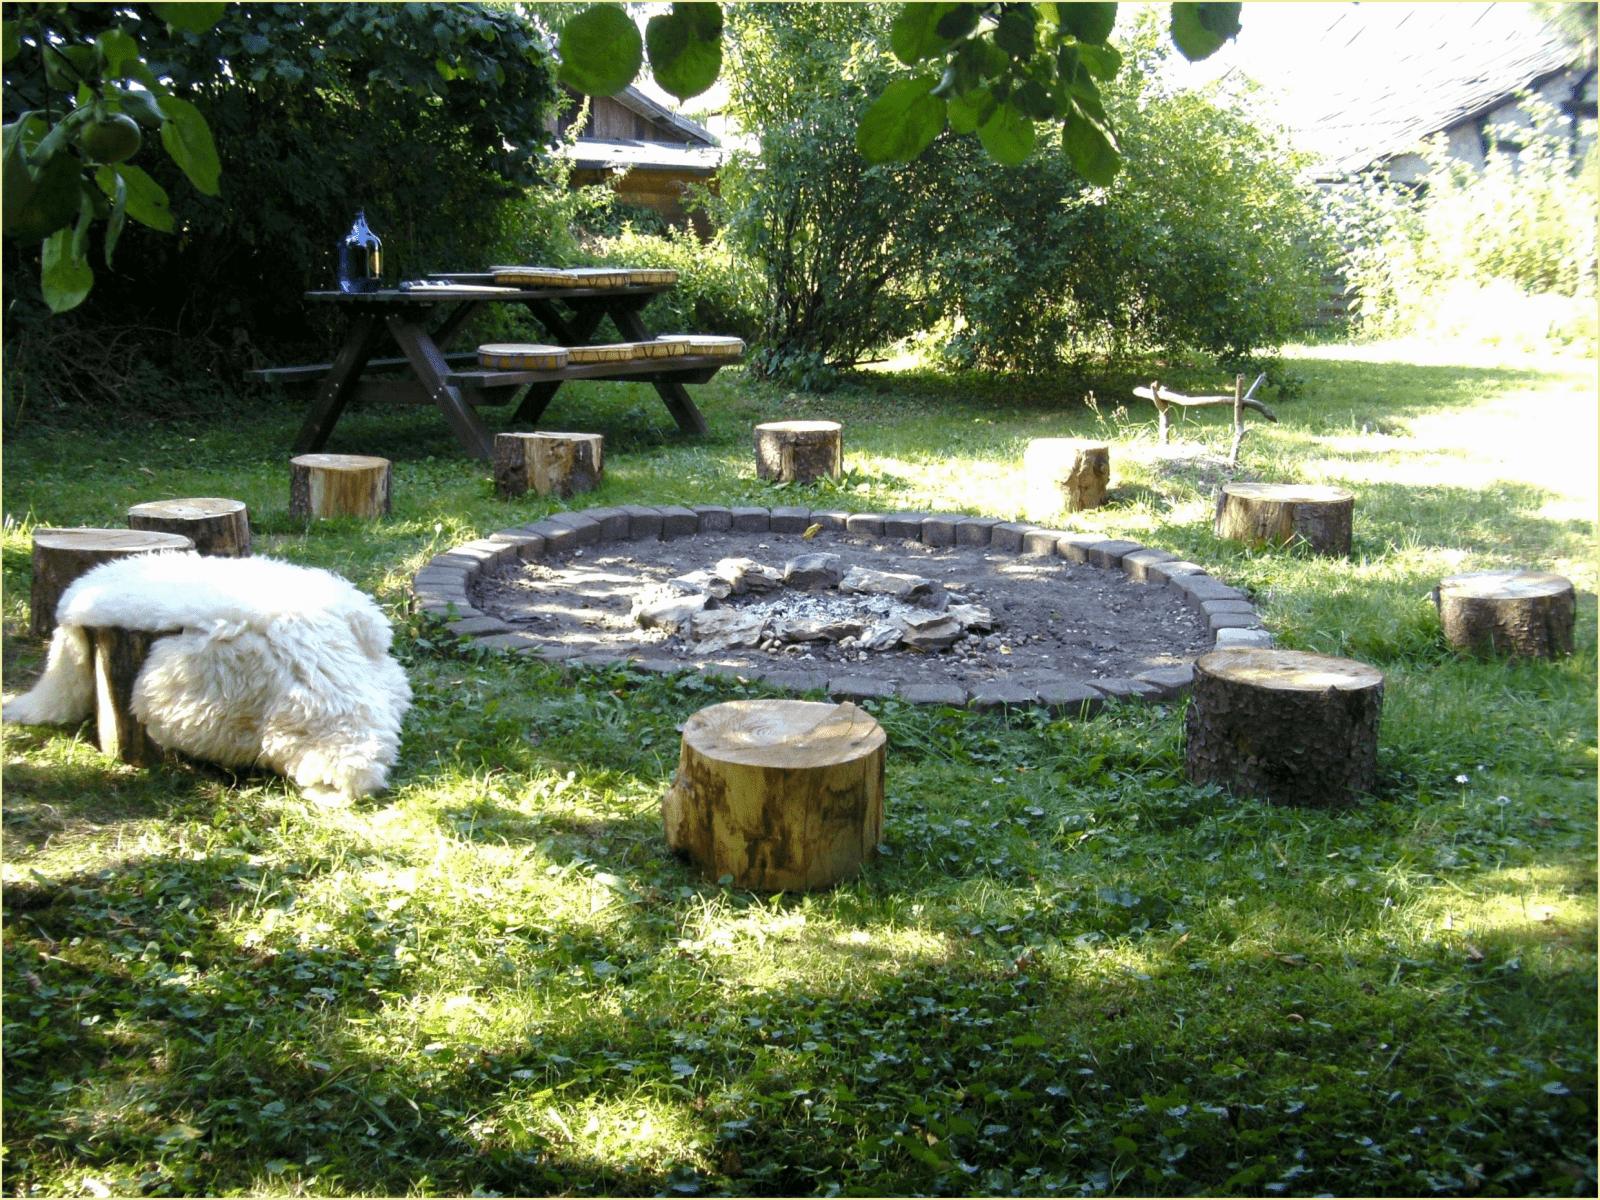 Garten Springbrunnen Selber Bauen 45 Luxus Brunnen Garten Grafik von Brunnen Bauen Im Garten Bild